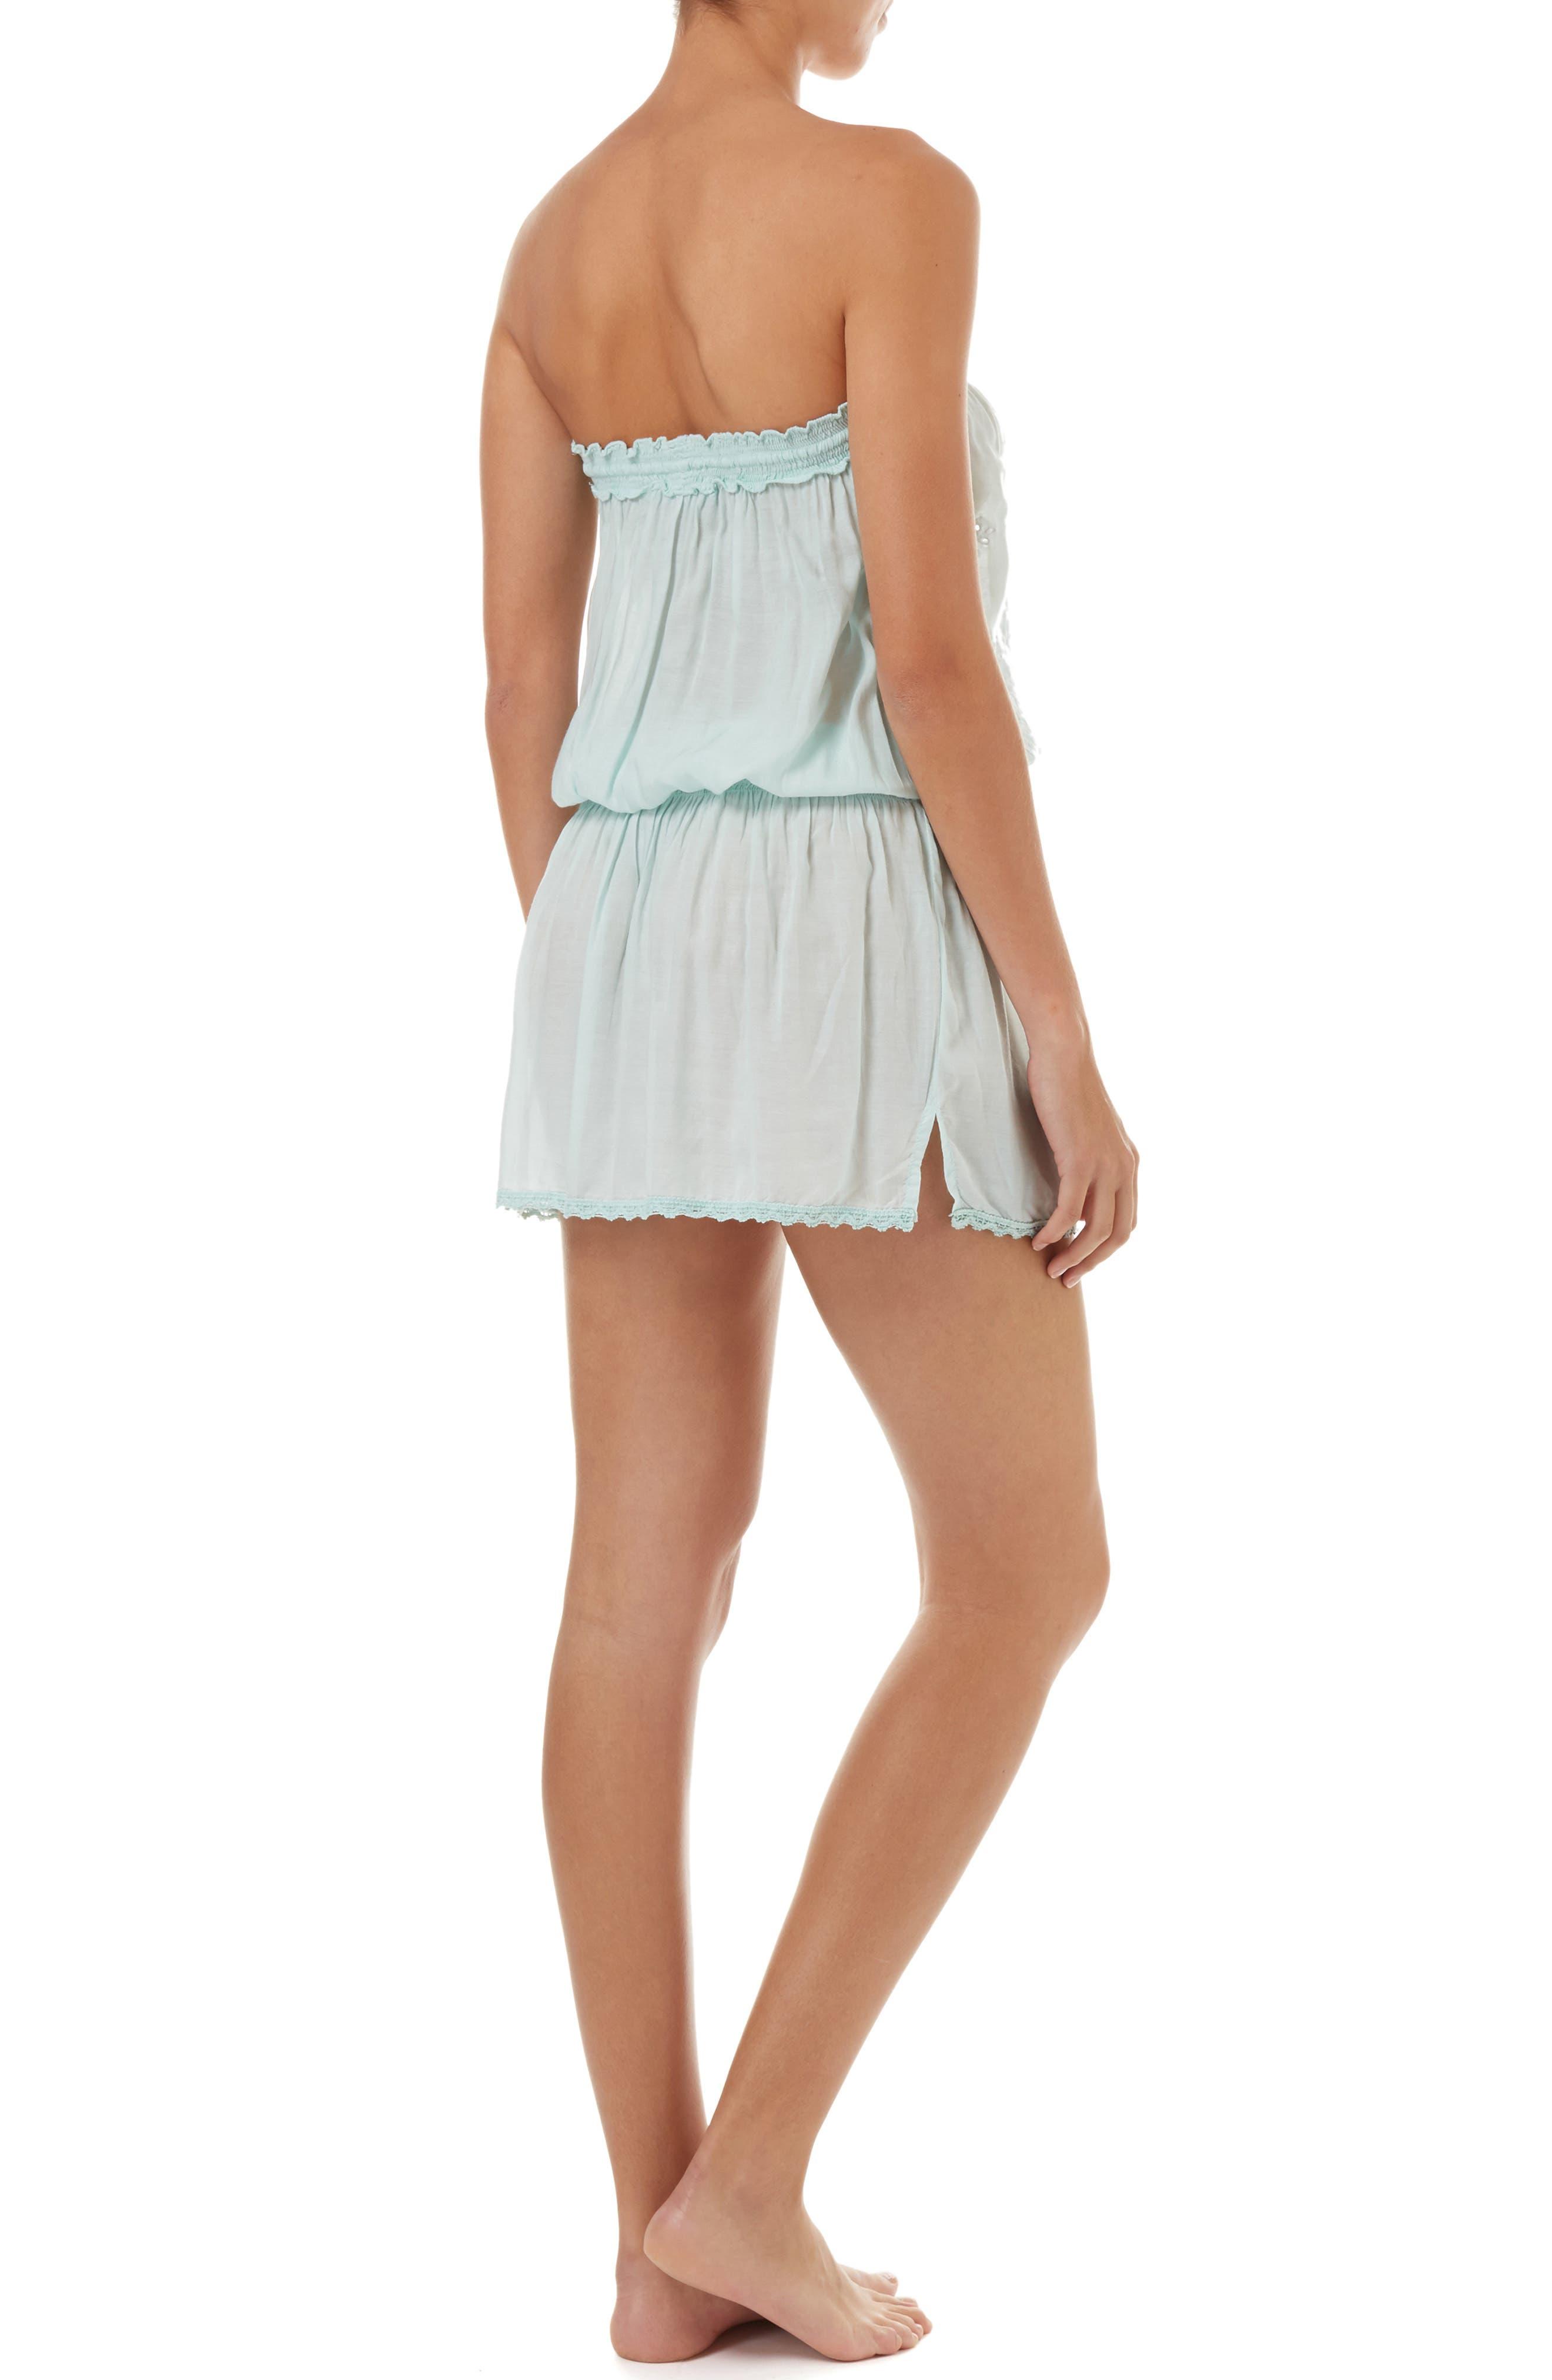 MELISSA ODABASH,                             Fruley Cover-Up Dress,                             Alternate thumbnail 2, color,                             MINT/ WHITE